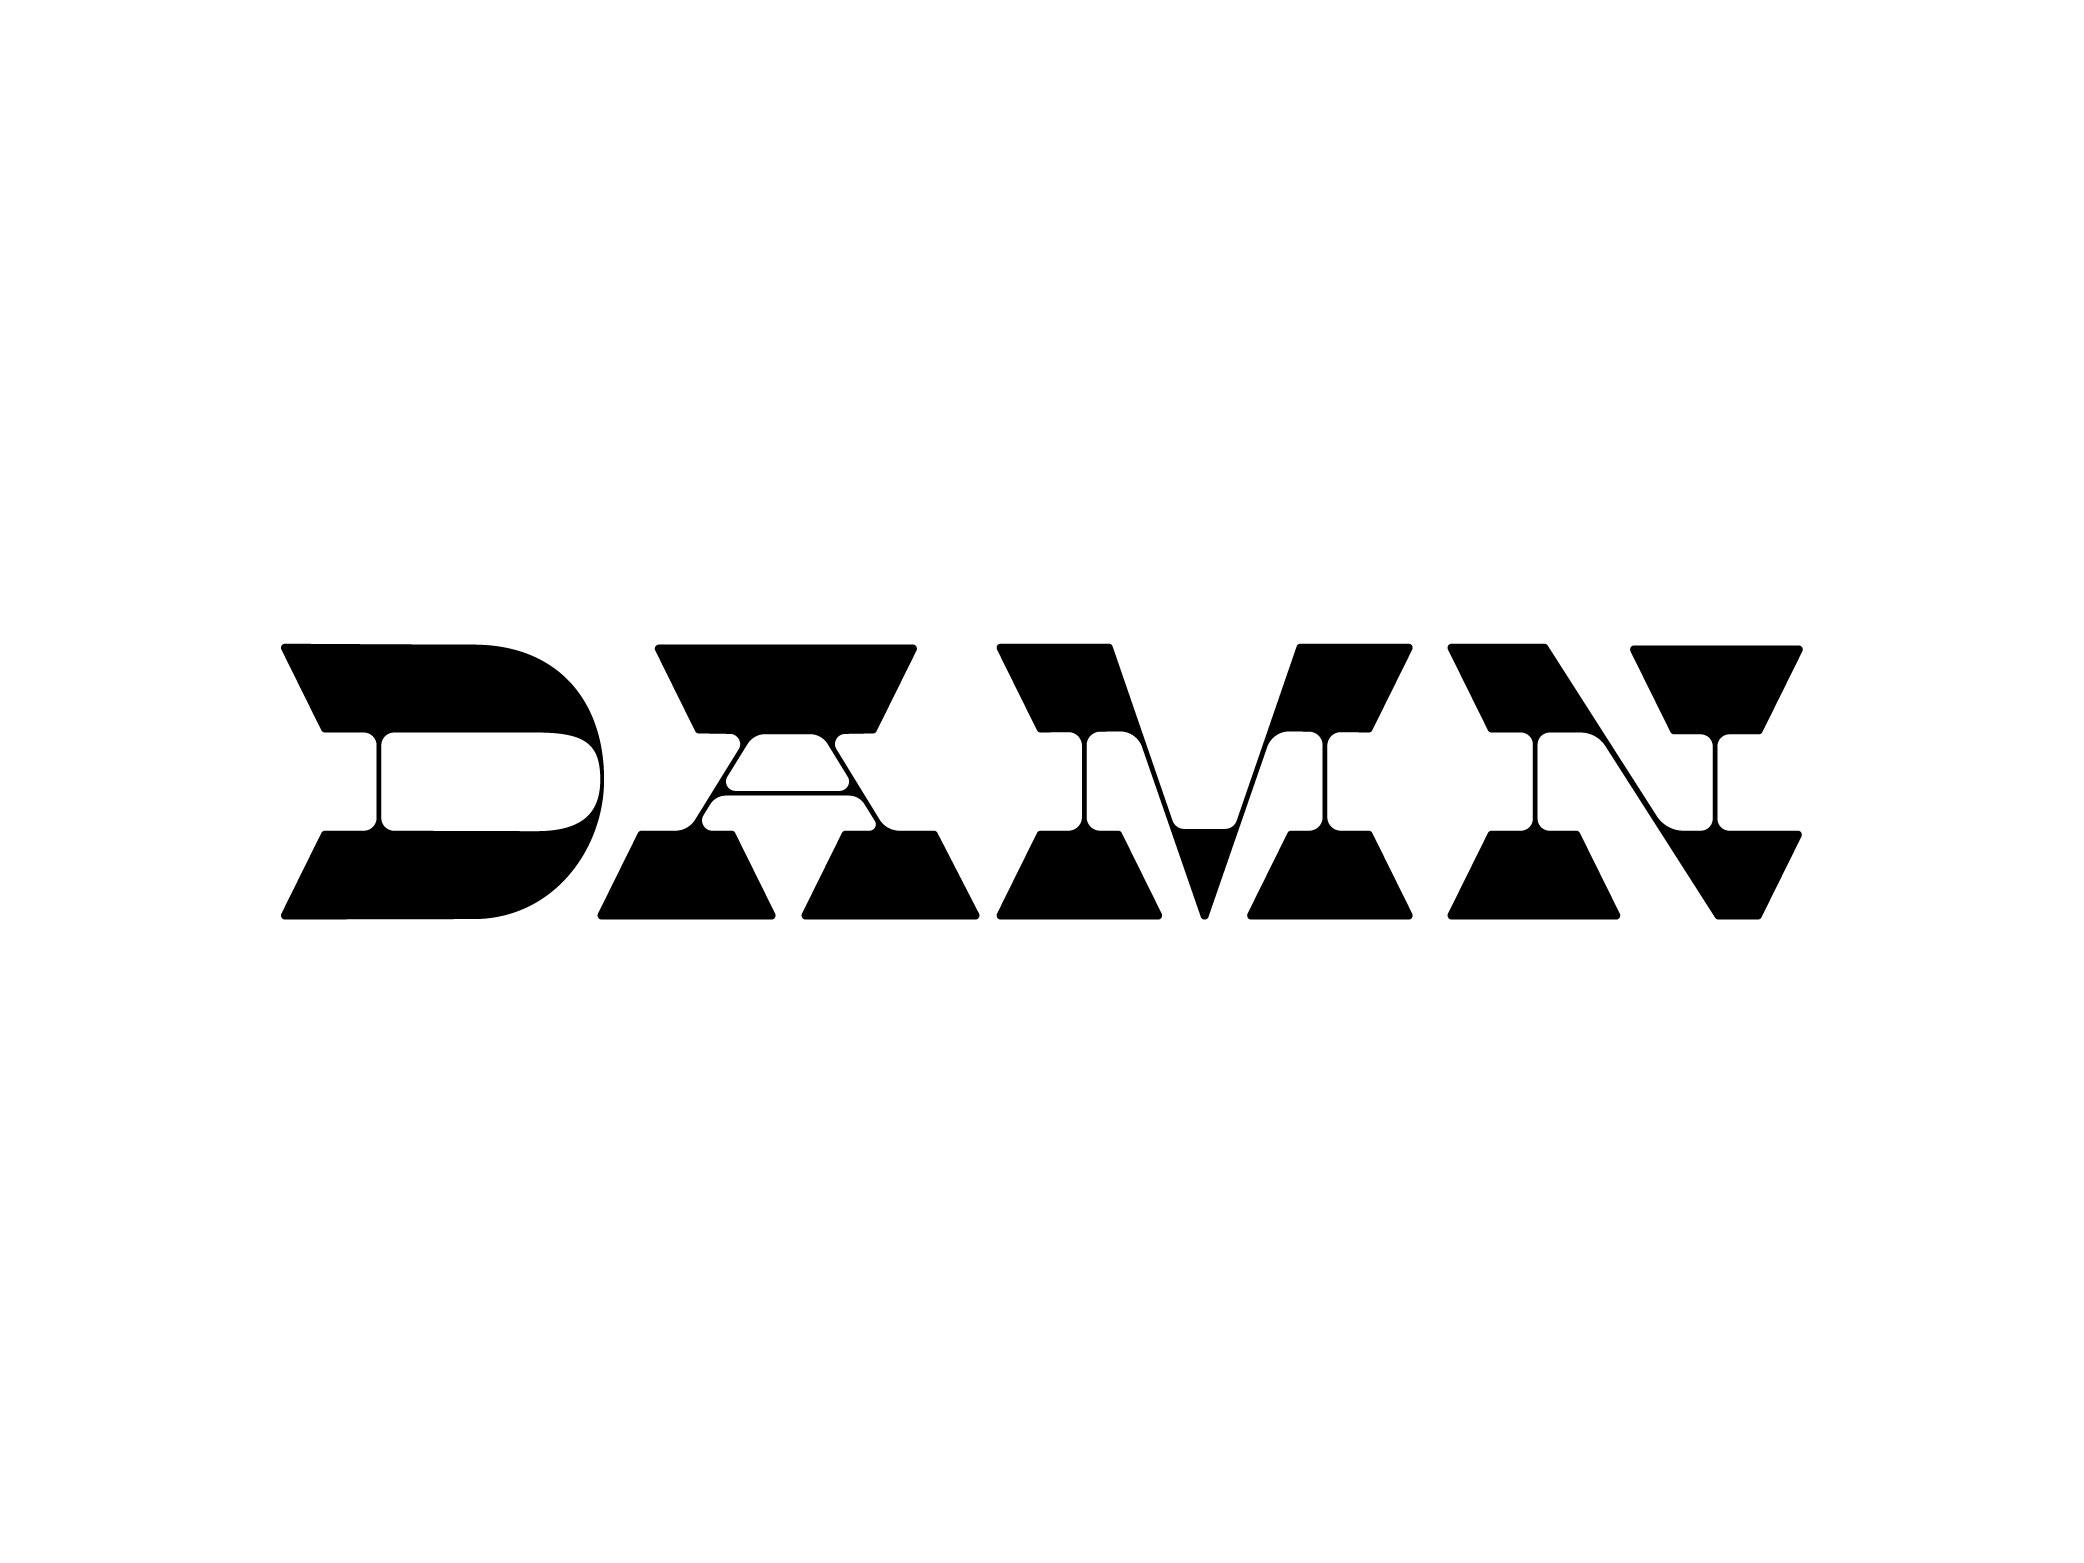 Studio Freight - Damn Type